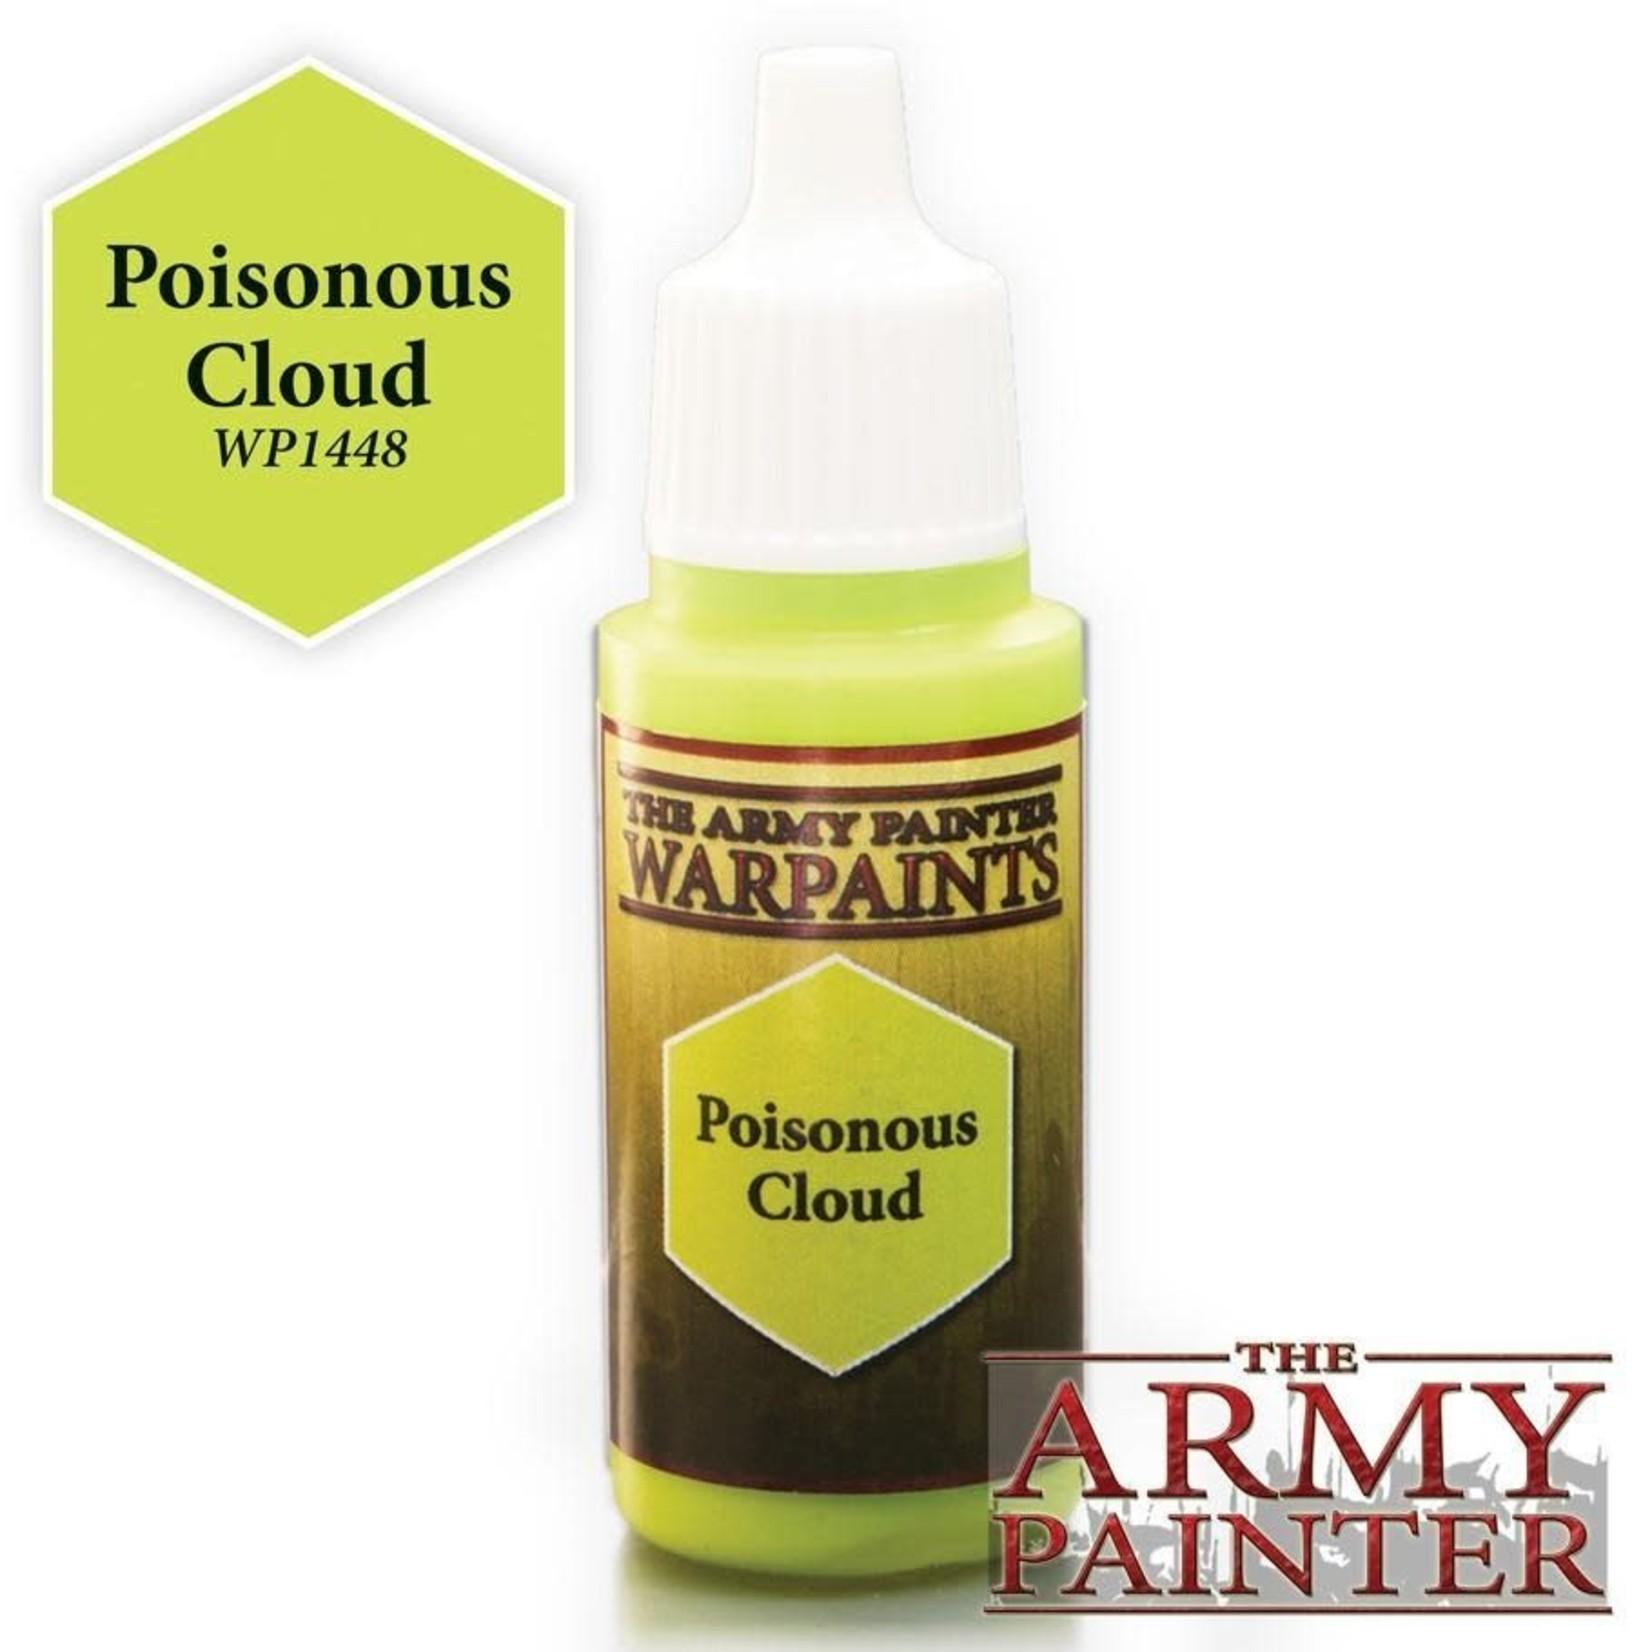 Army Painter APWP Poisonous Cloud  18ml